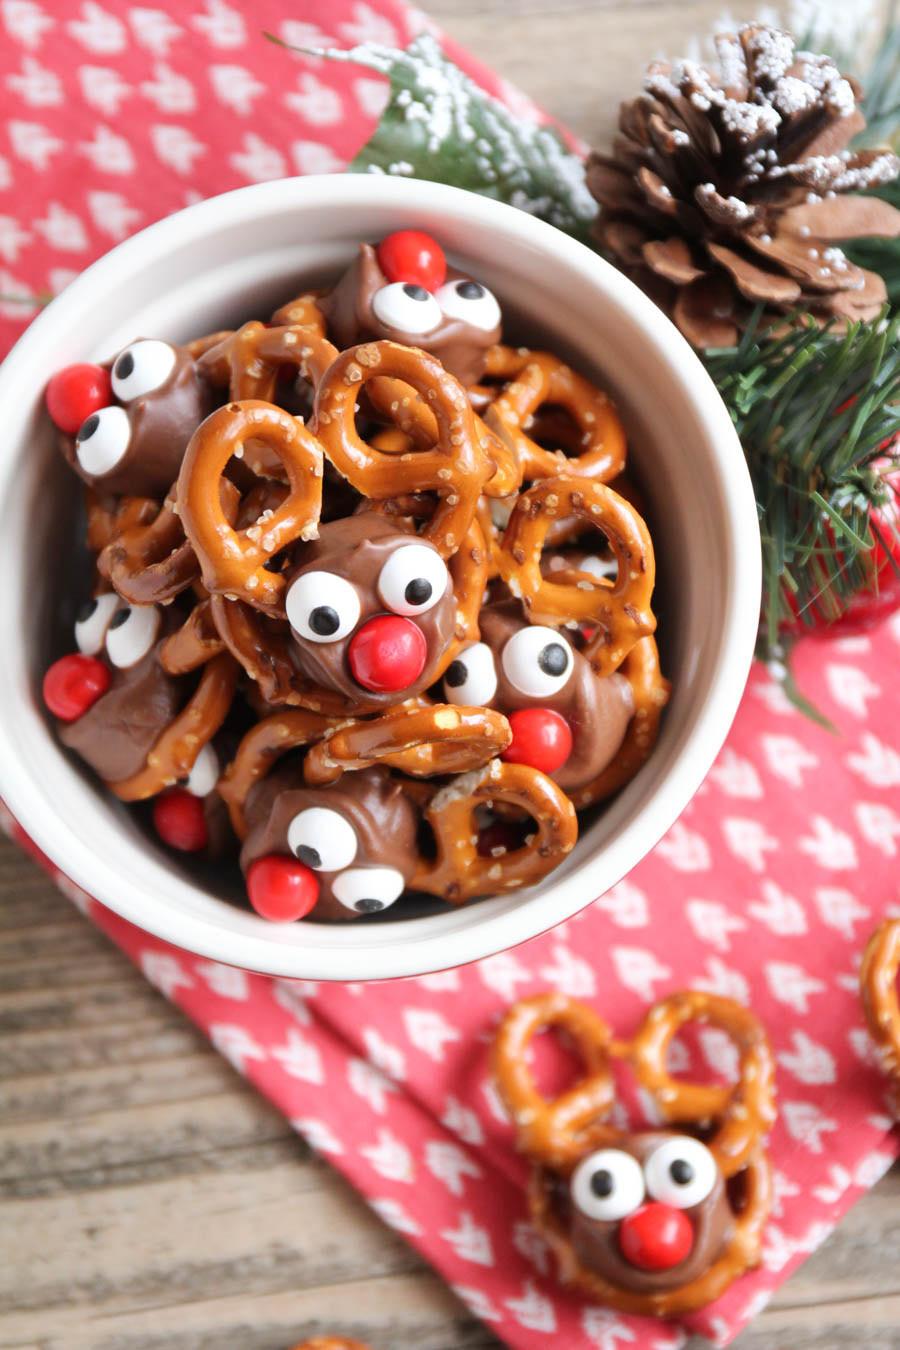 Christmas Pretzels Recipes  25 Fun Christmas Treat Ideas – Fun Squared